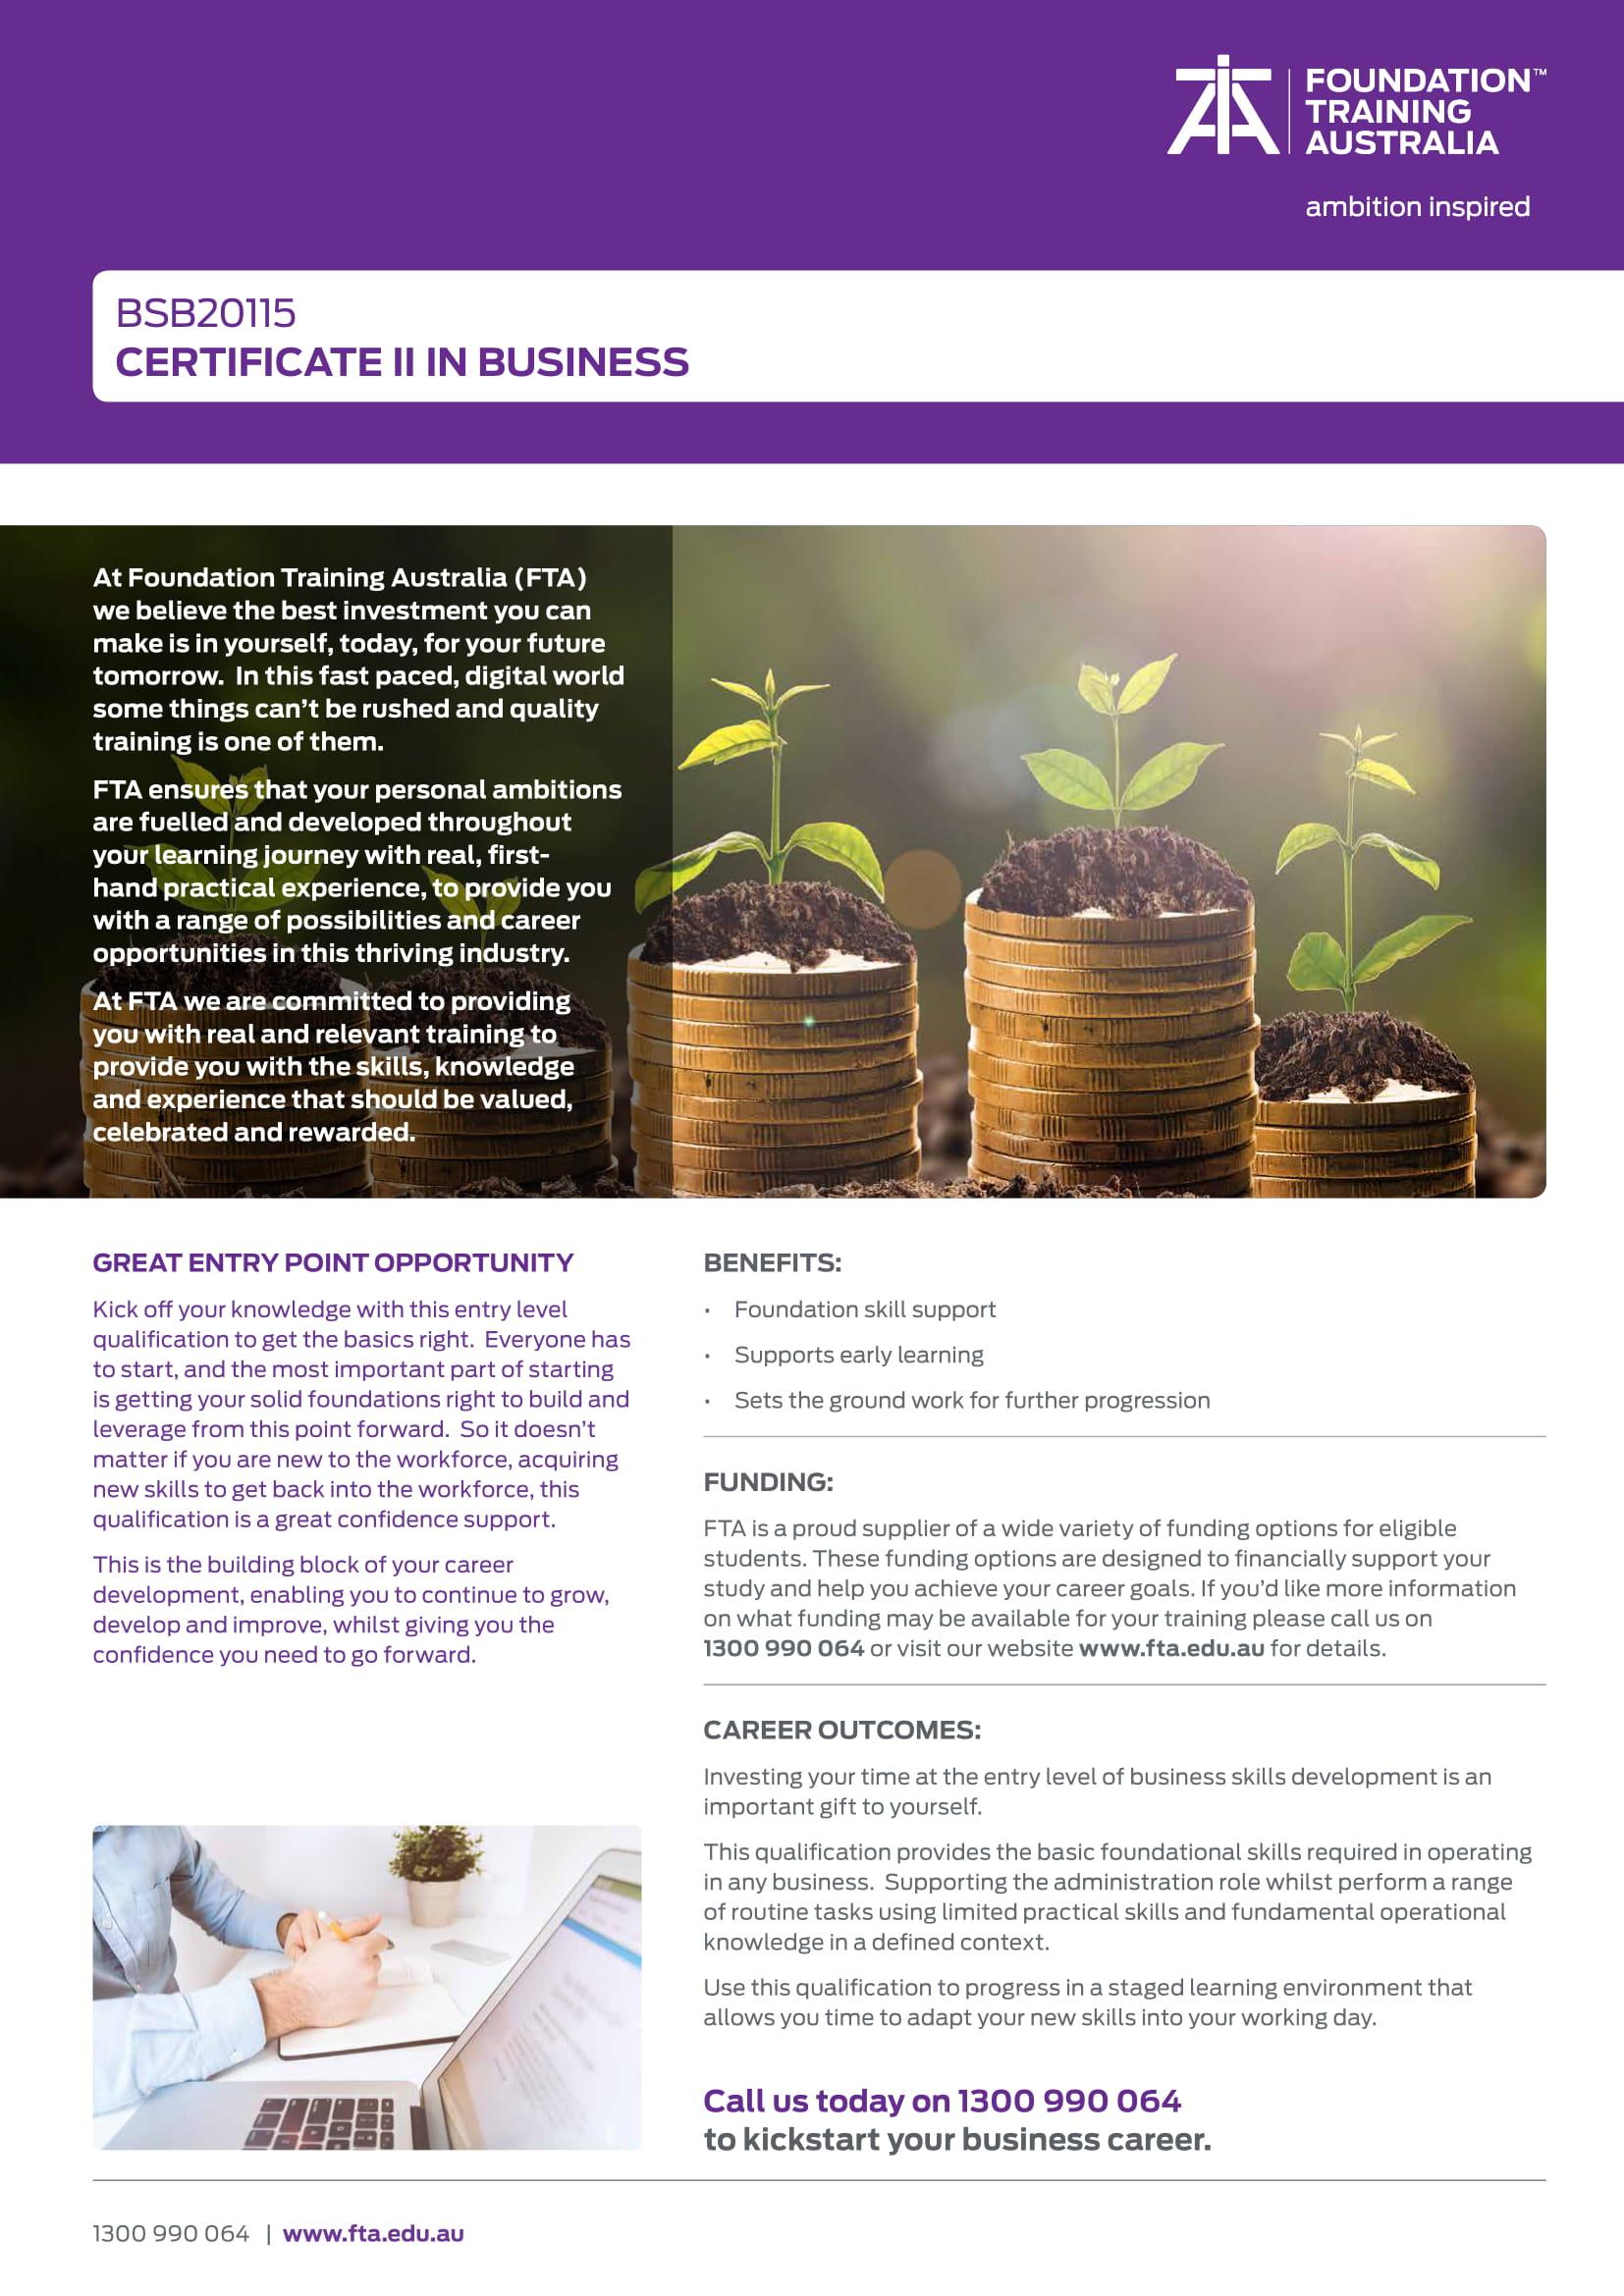 https://www.fta.edu.au/wp-content/uploads/2020/06/TP1.MK_.027-Certificate-II-in-Business-BSB20115-V1-DIGITAL-1.jpg